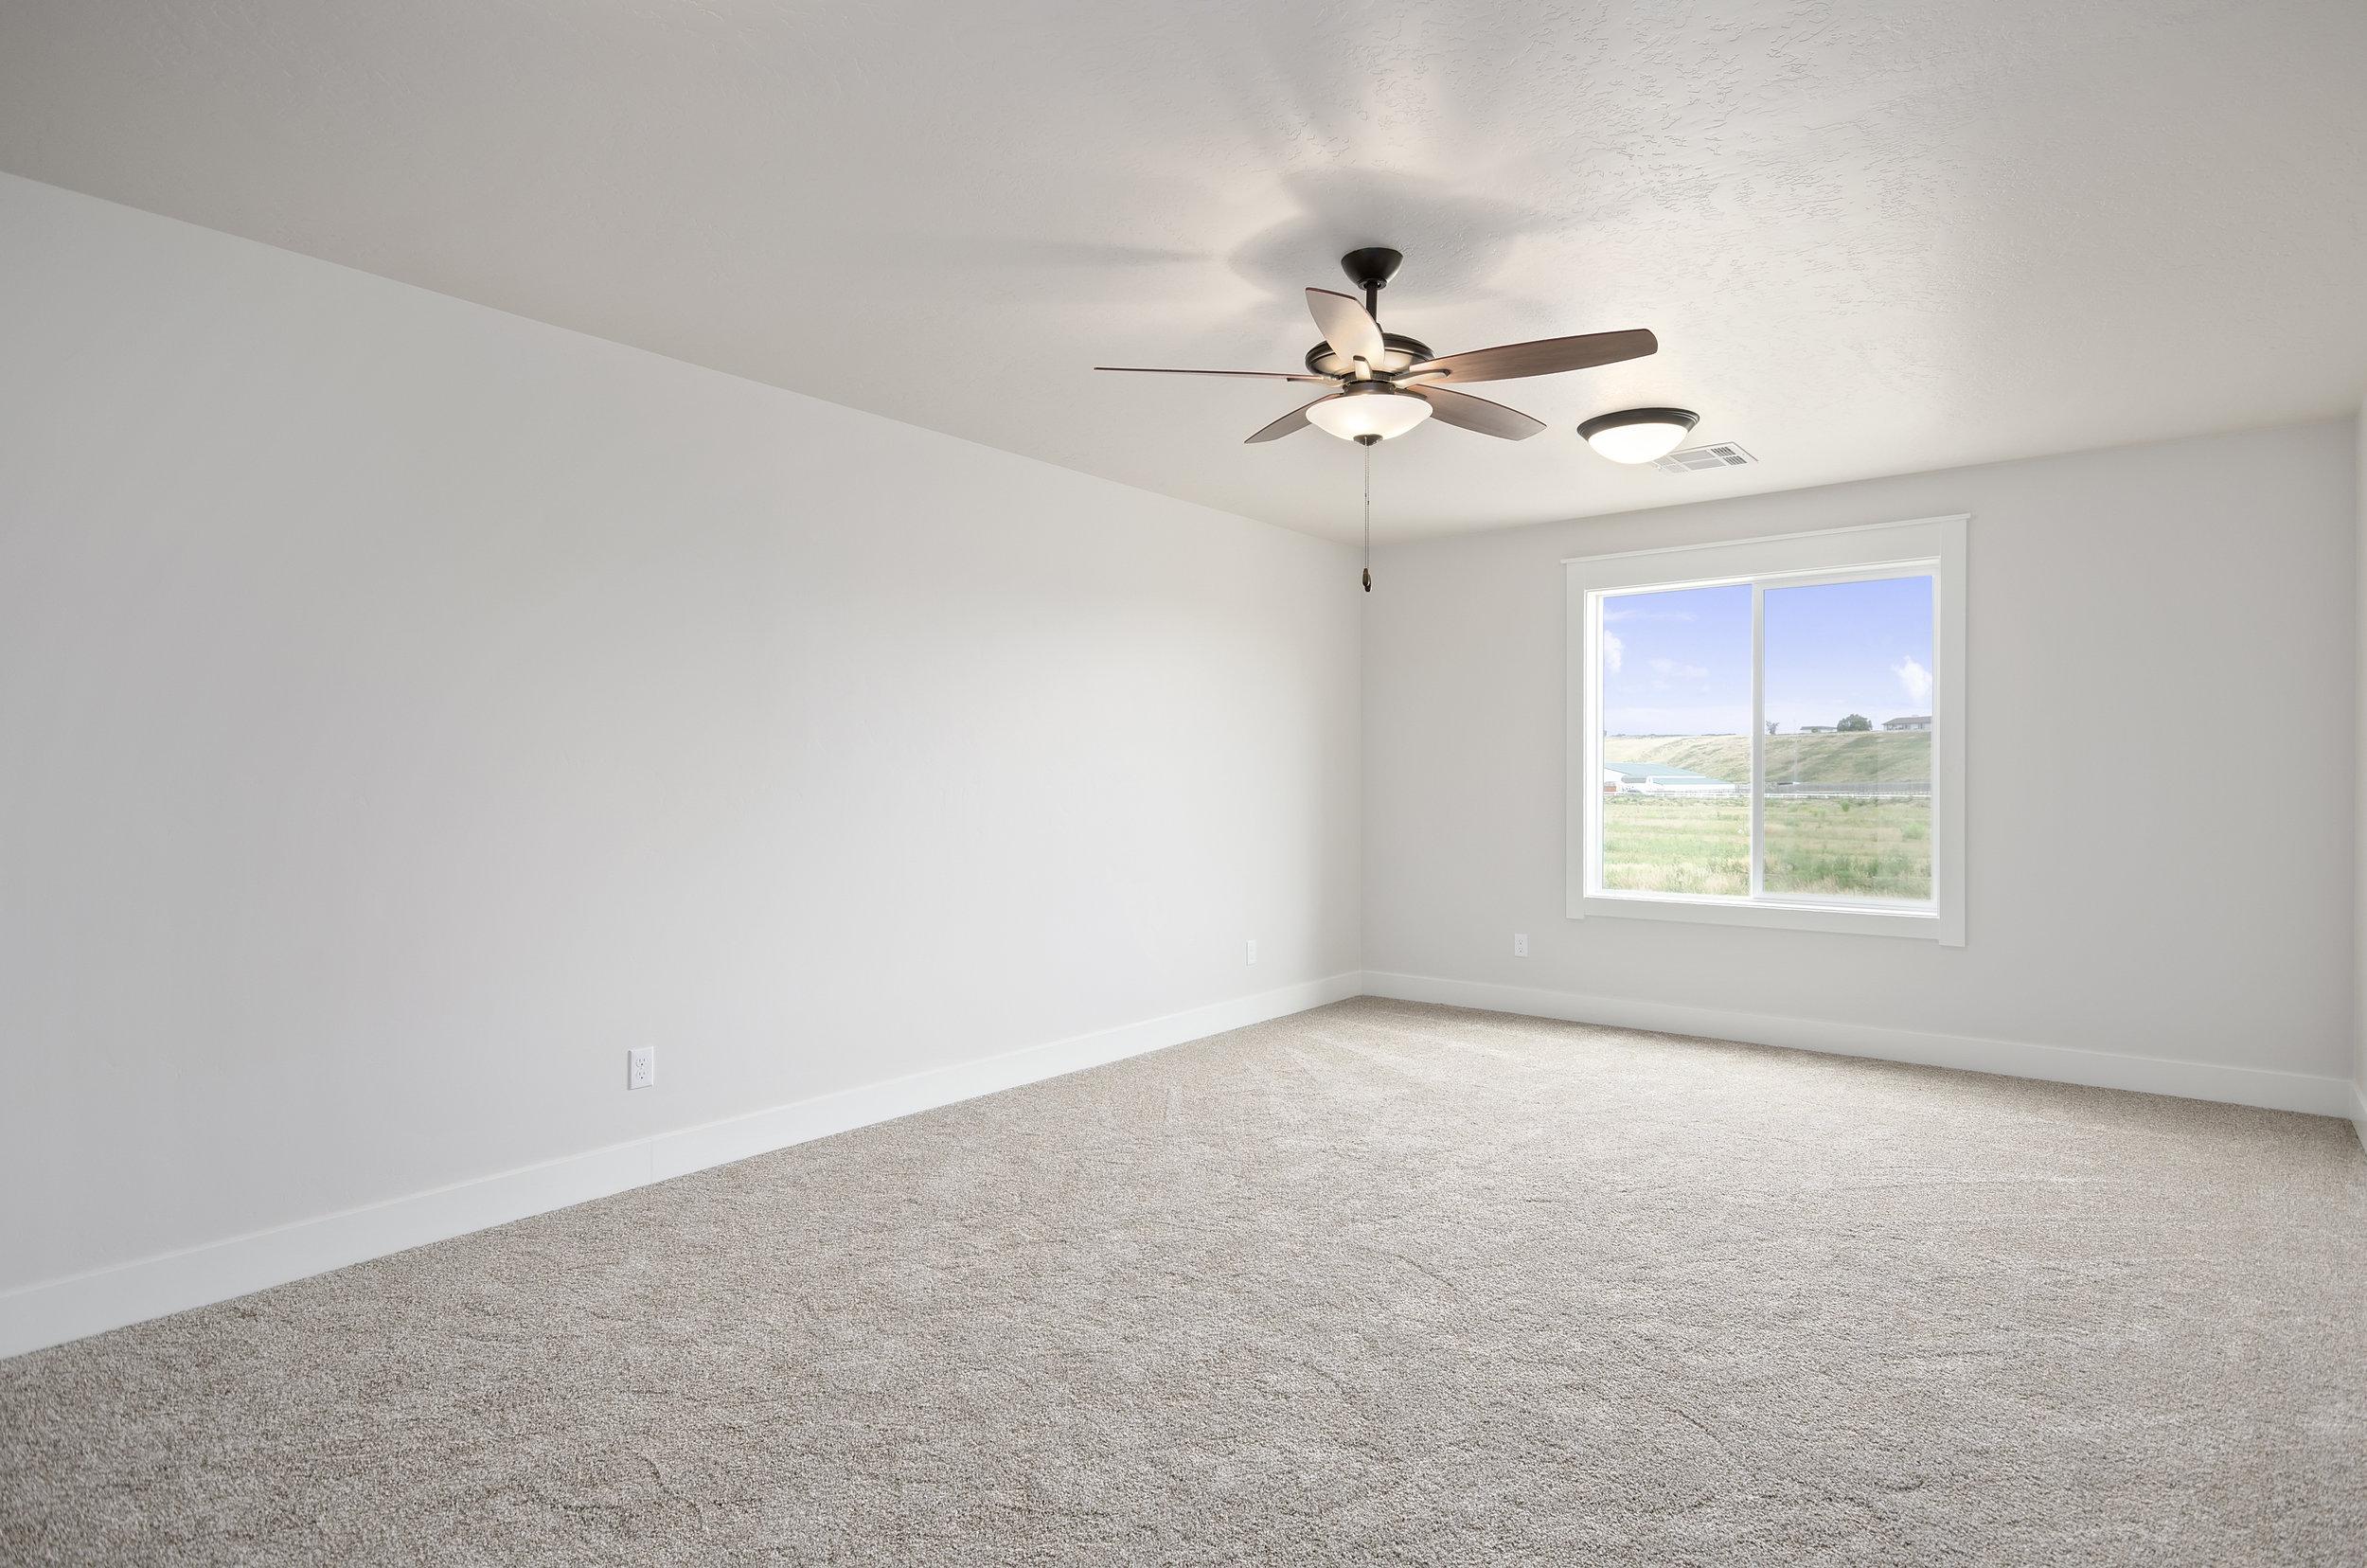 39-Bedroom.jpg